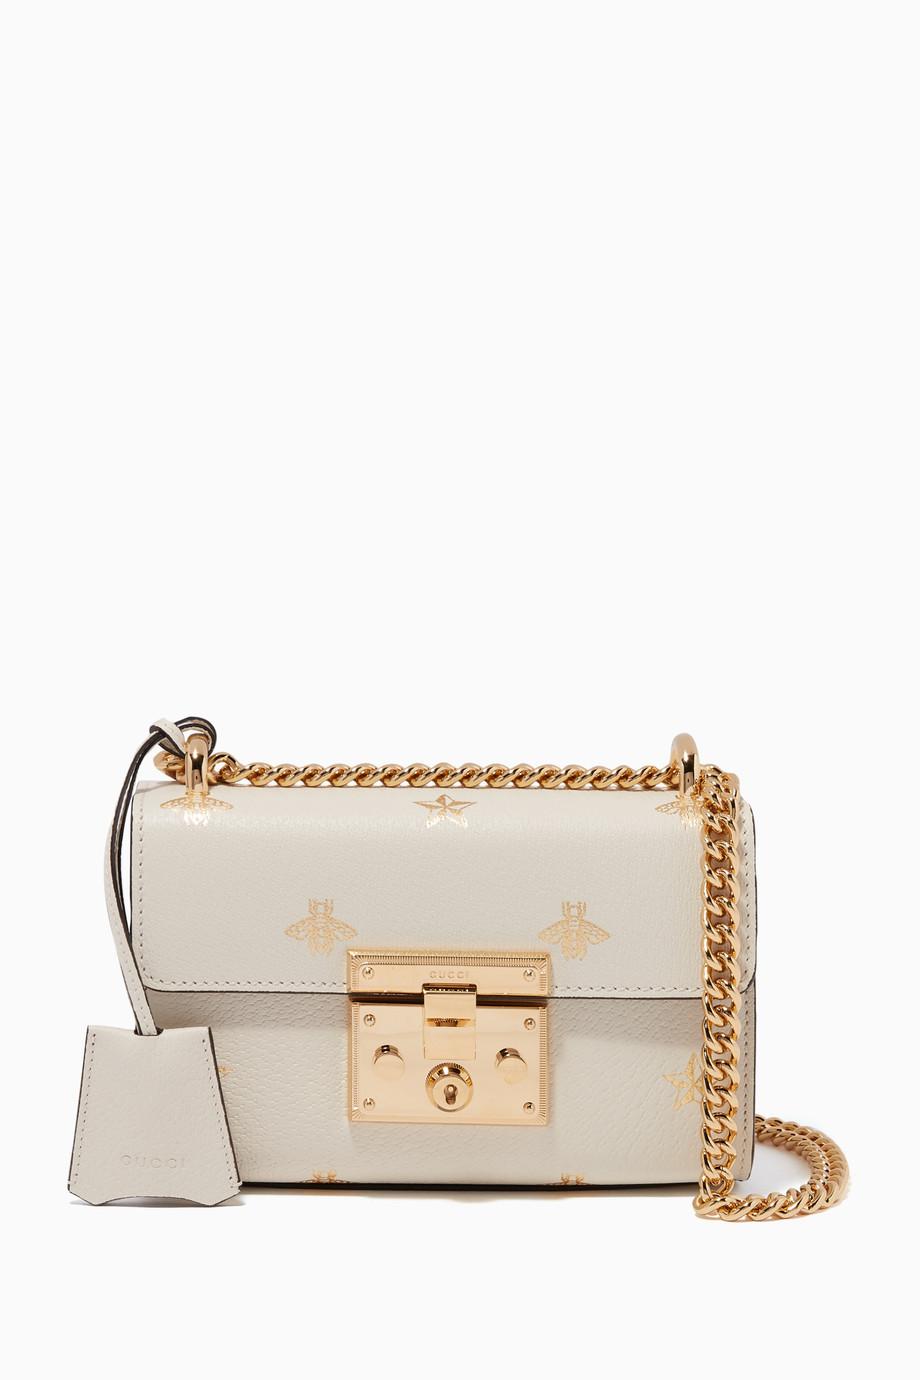 1afcb525cc48 Shop Gucci Neutral Ivory Stars   Bees Printed Padlock Shoulder Bag ...